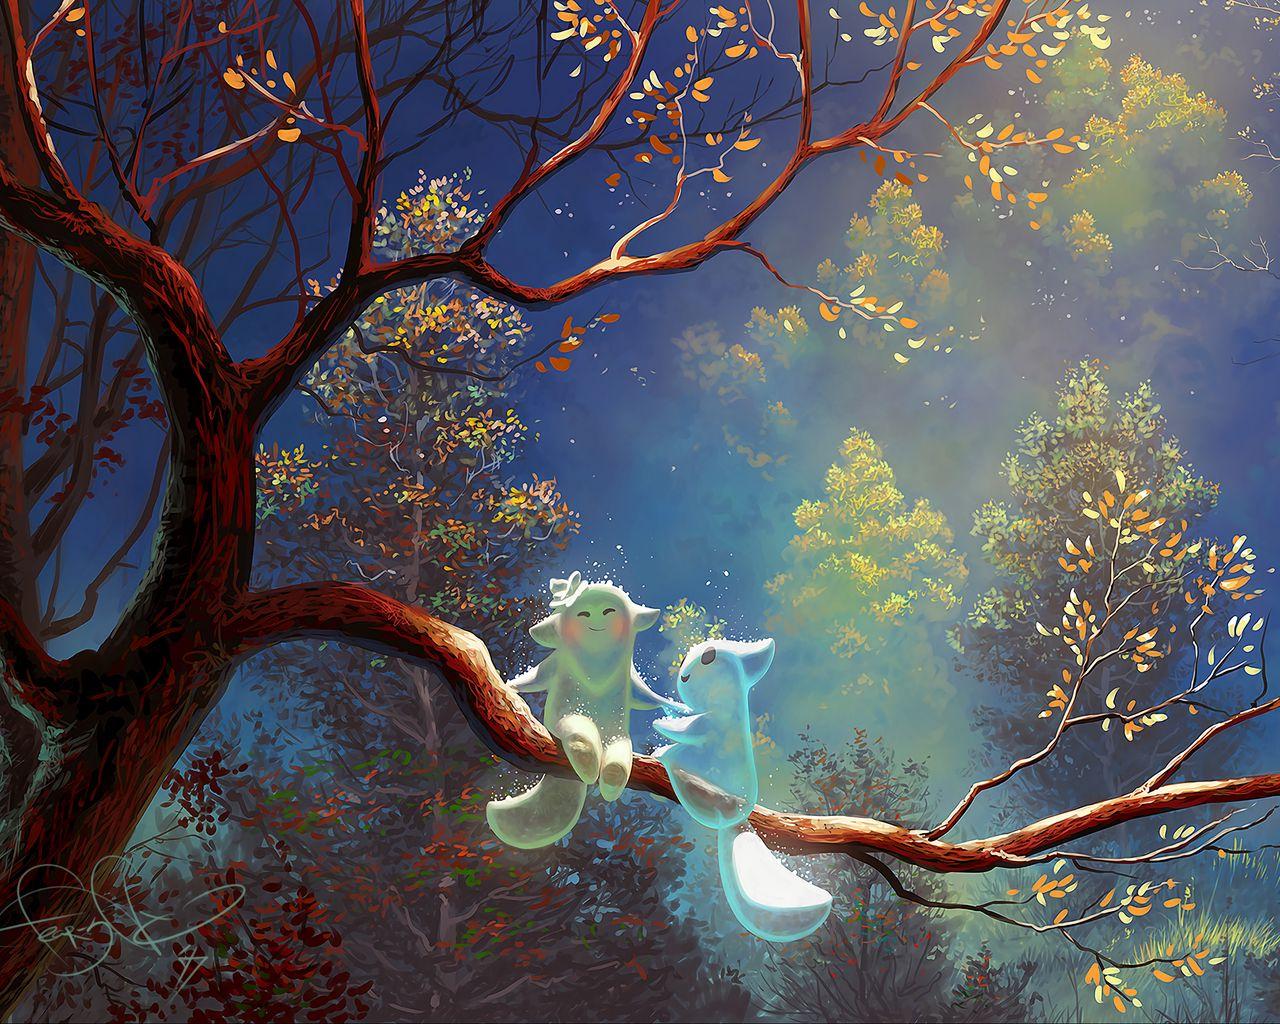 1280x1024 Wallpaper animals, tree, branch, magic, art, fantasy